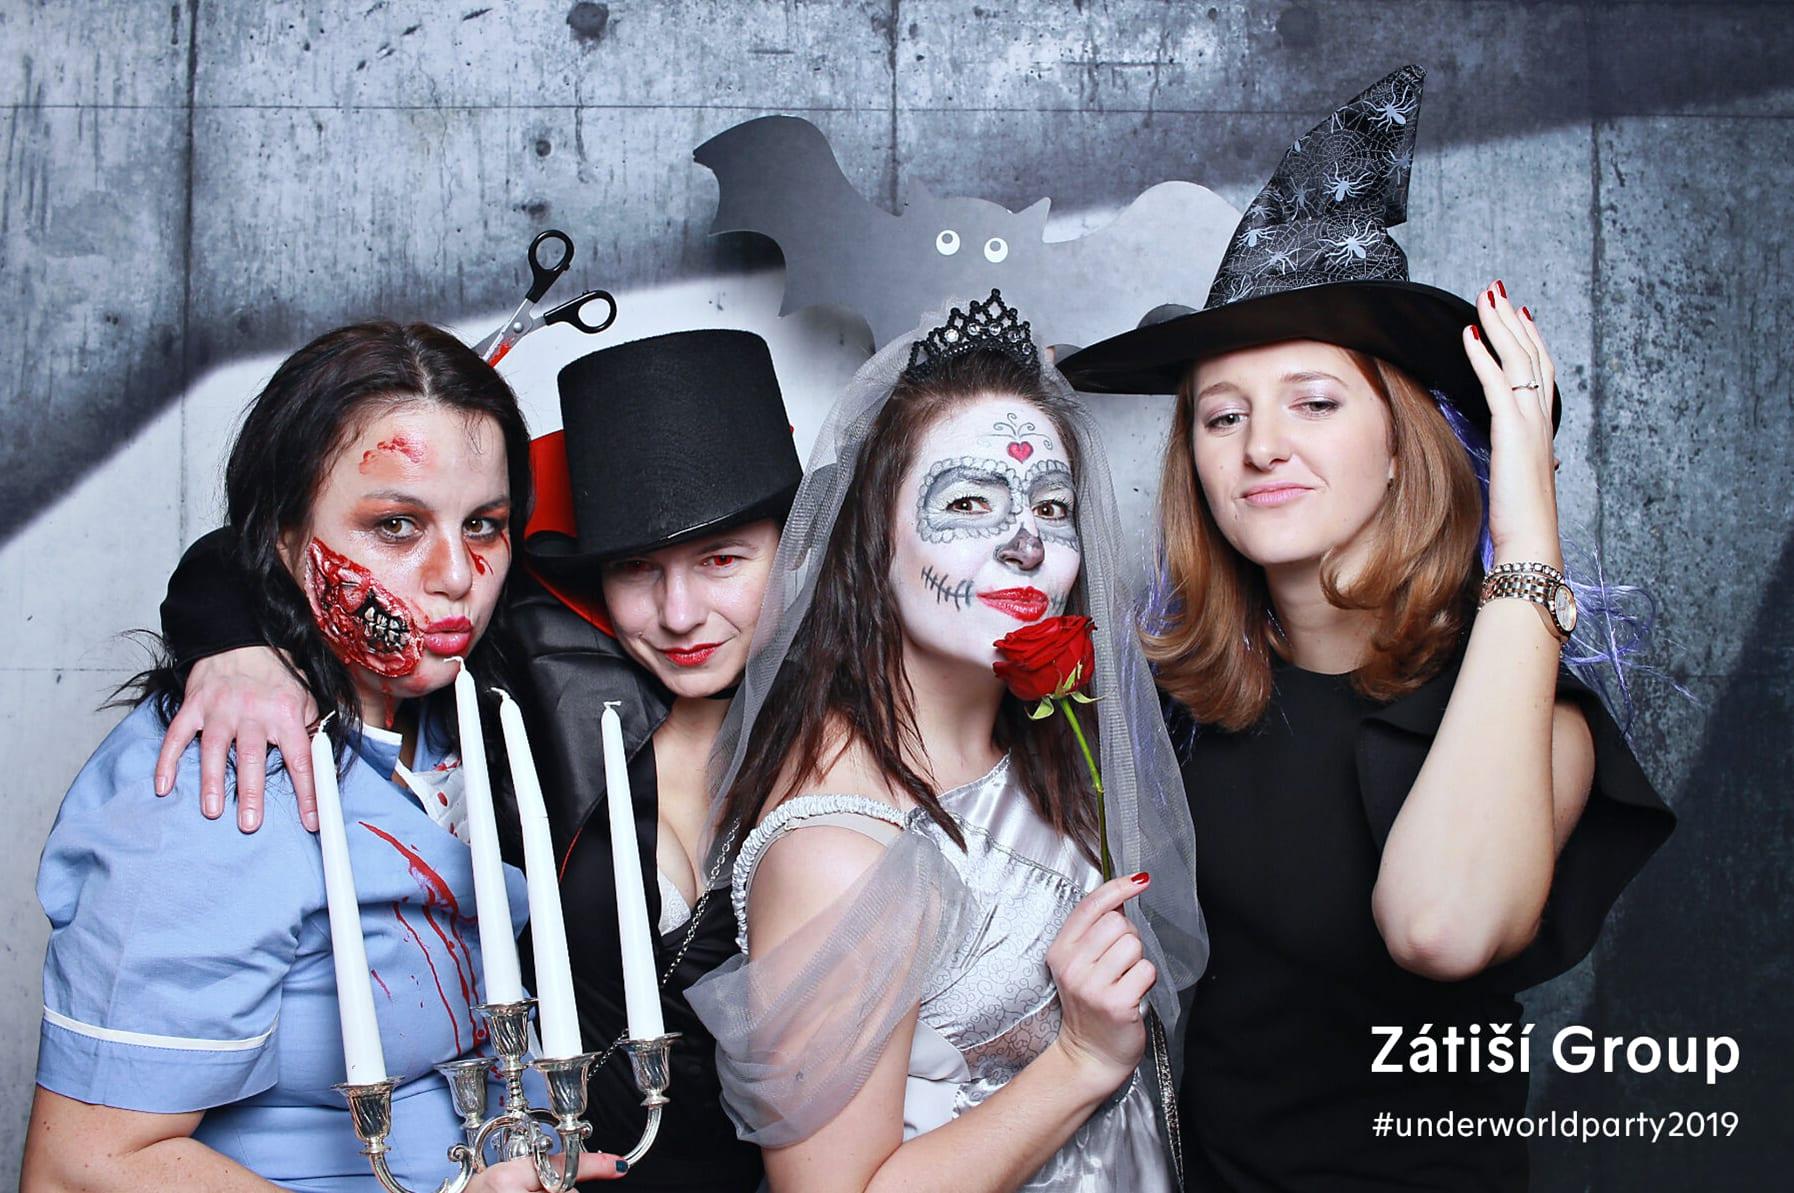 fotokoutek-zatisi-group-underworld-party-15-1-2019-566349